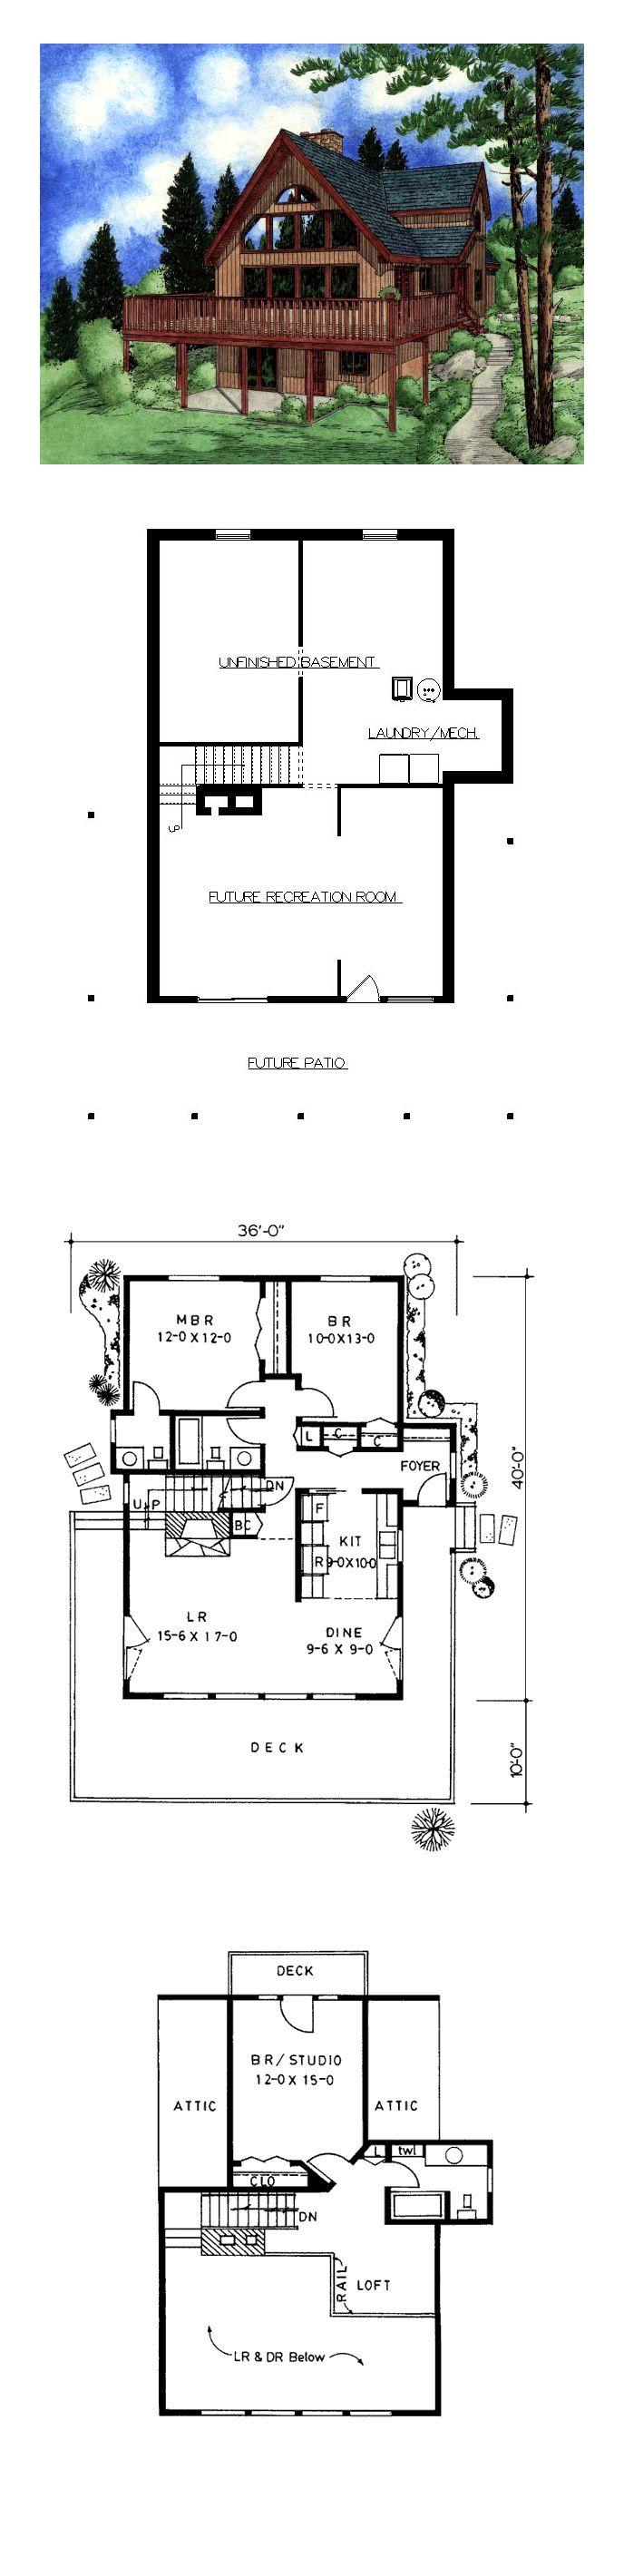 49 best images about hillside home plans on pinterest